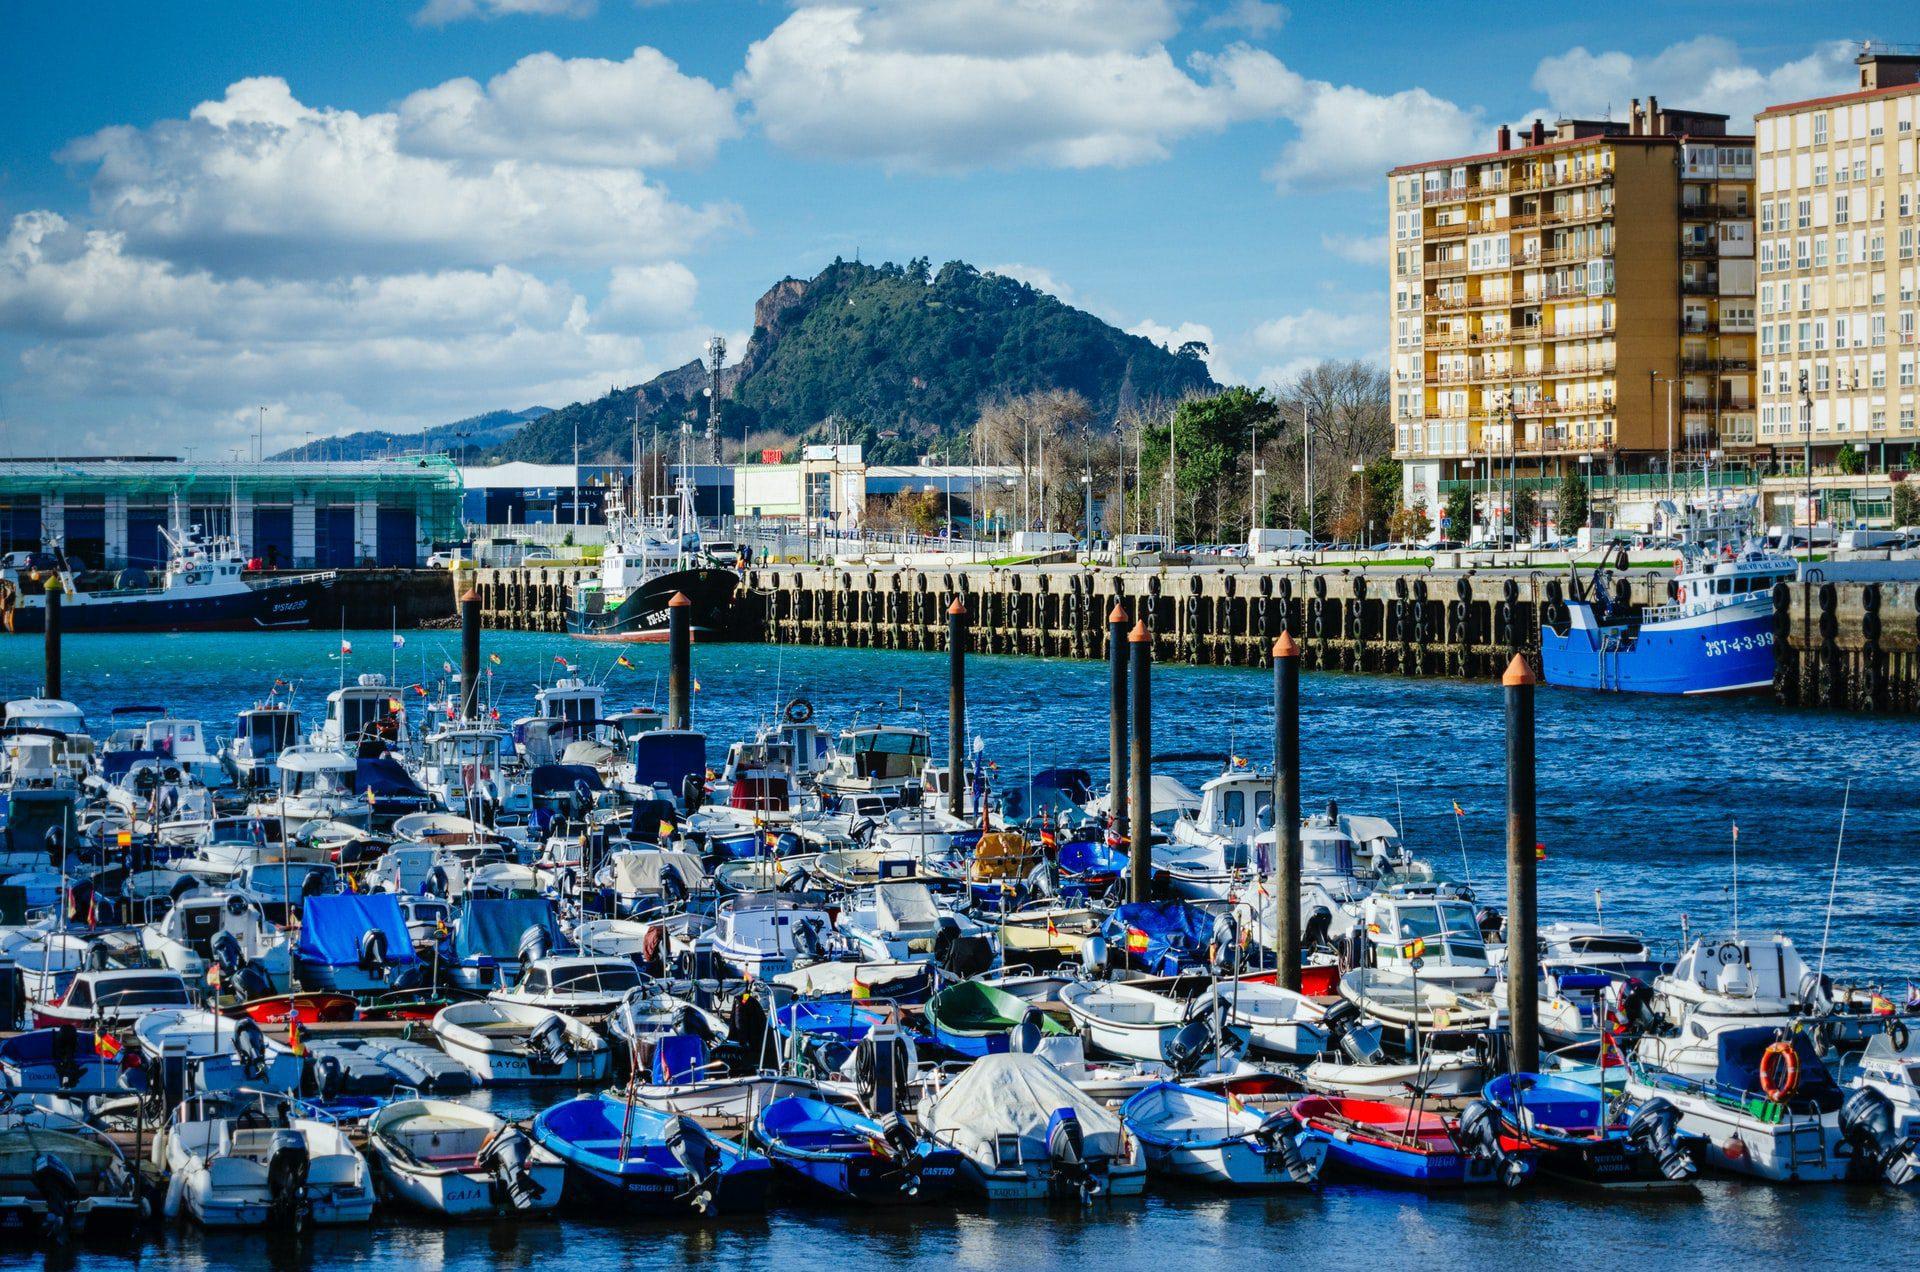 Trajet : Bilbao à Santander